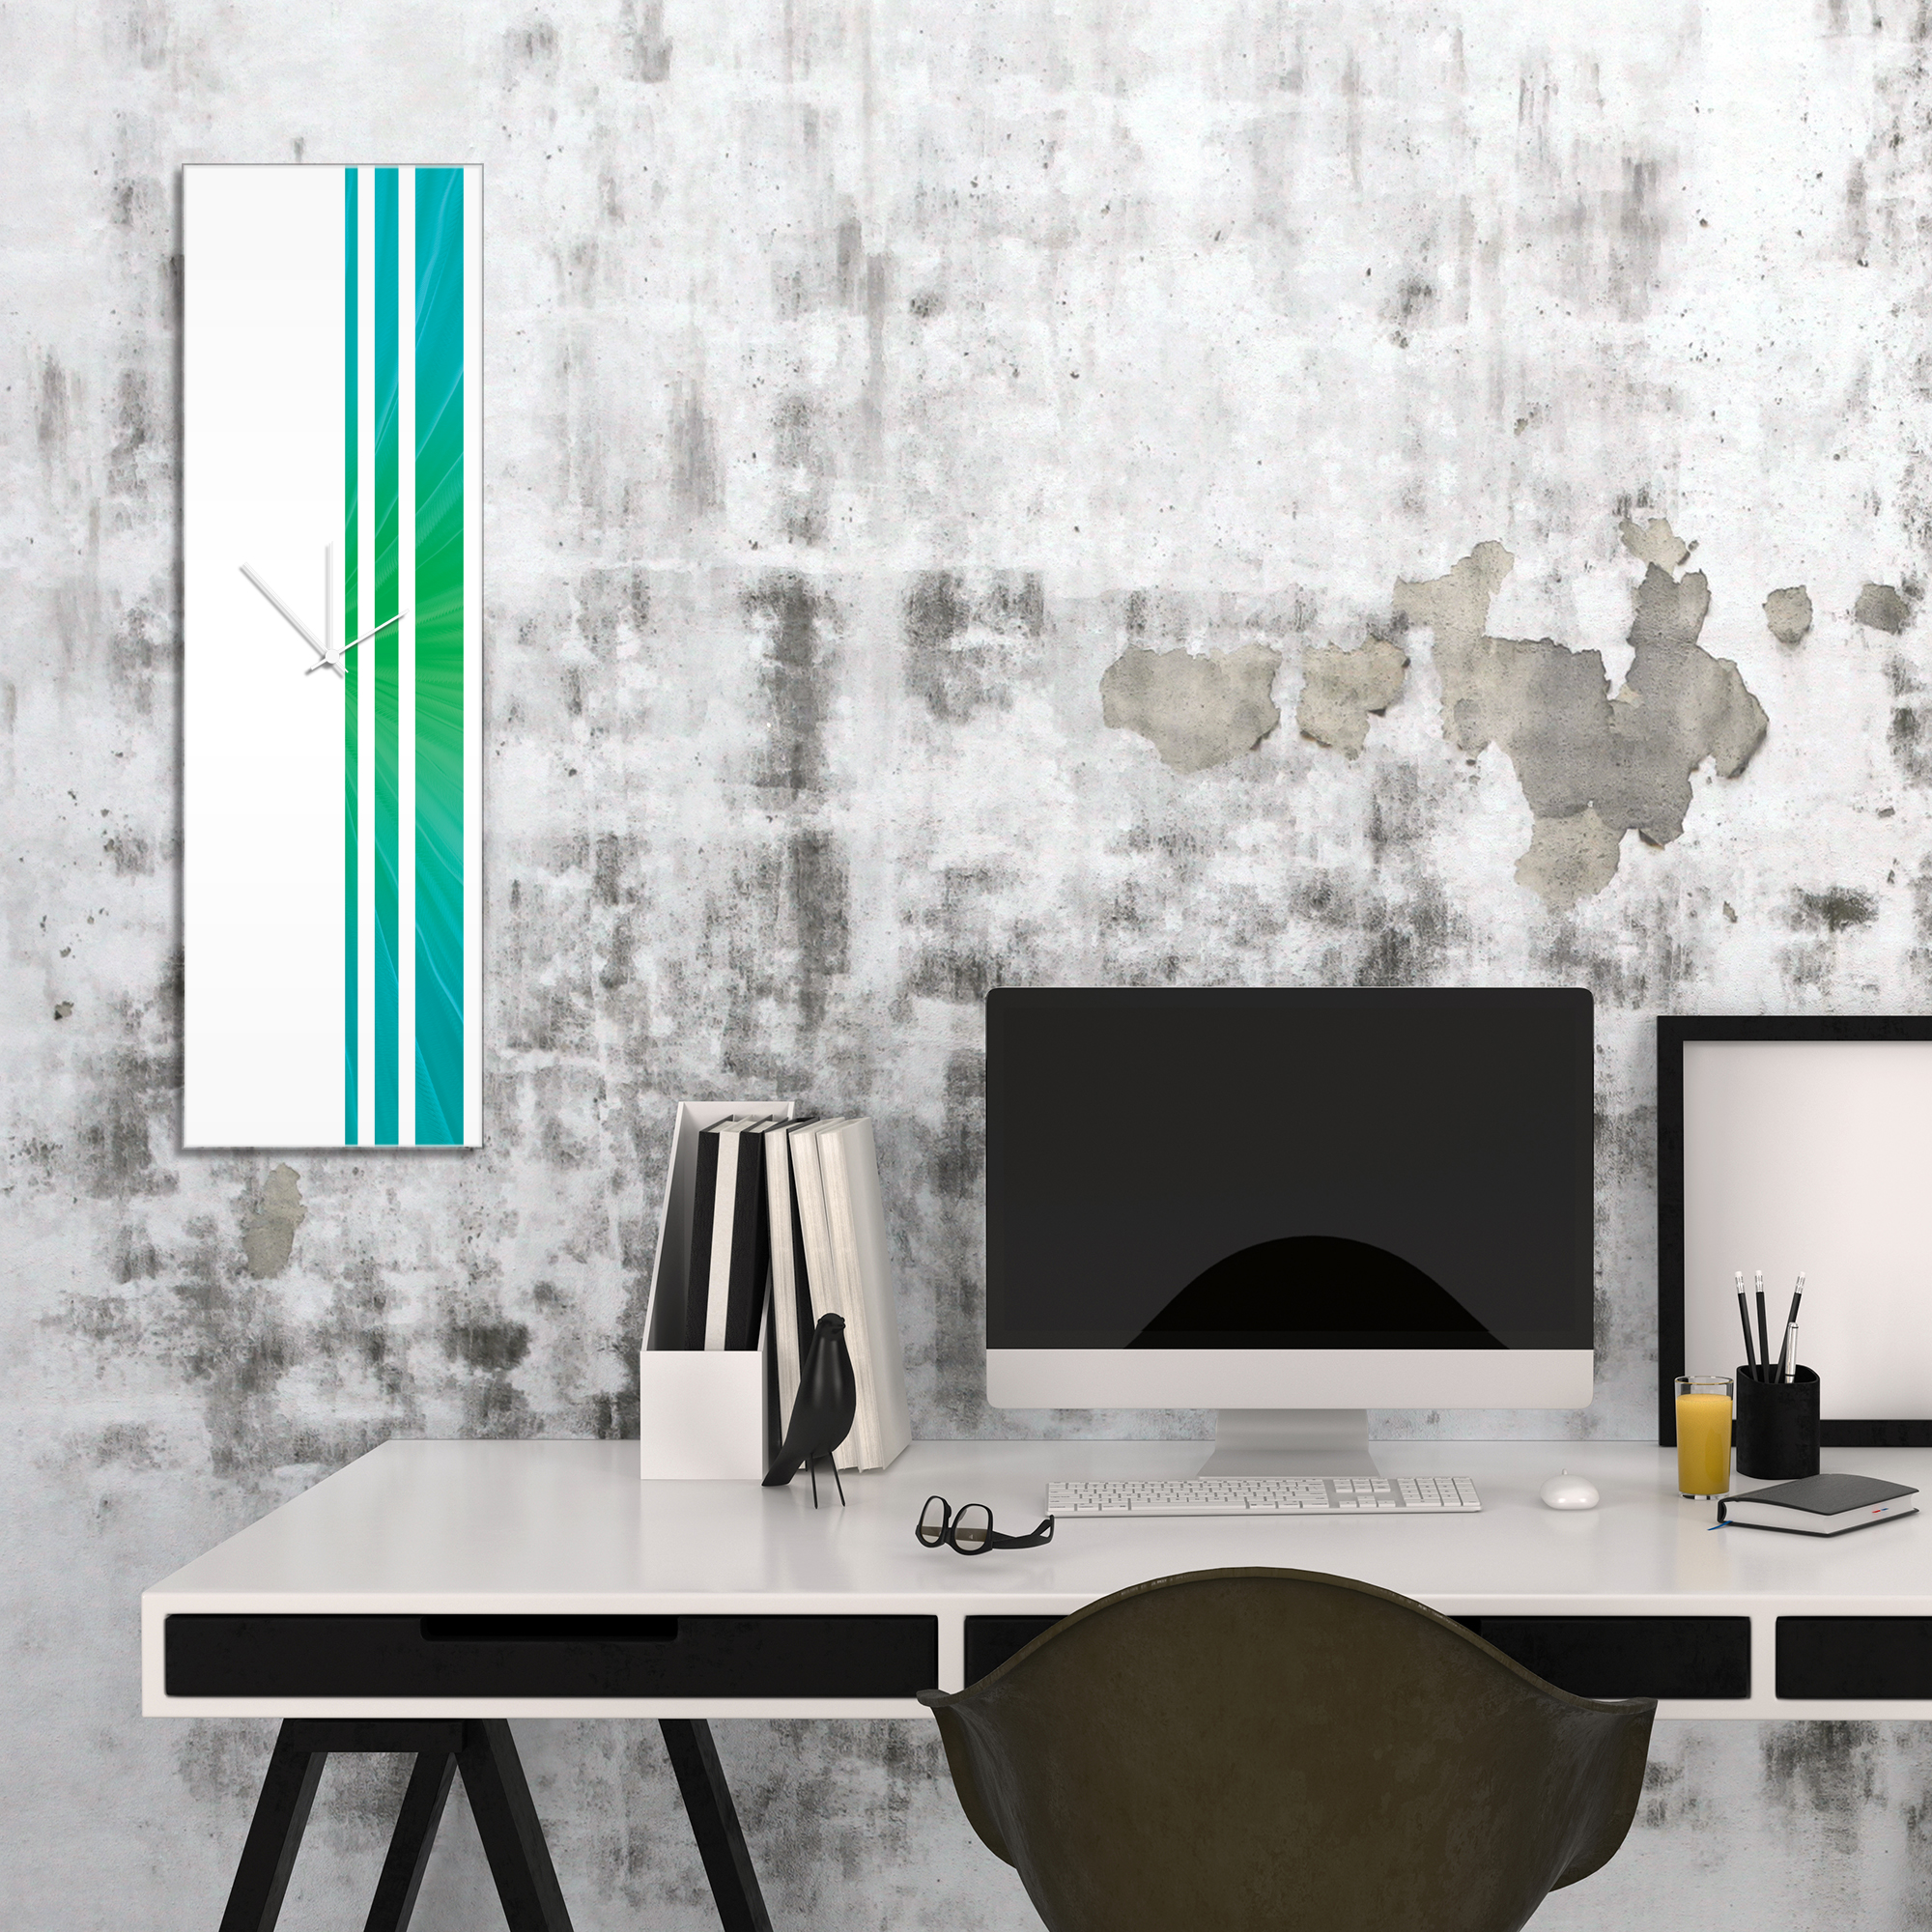 Caribbean Triple Stripe Clock by Adam Schwoeppe Large Modern Clock on Acrylic - Alternate View 1